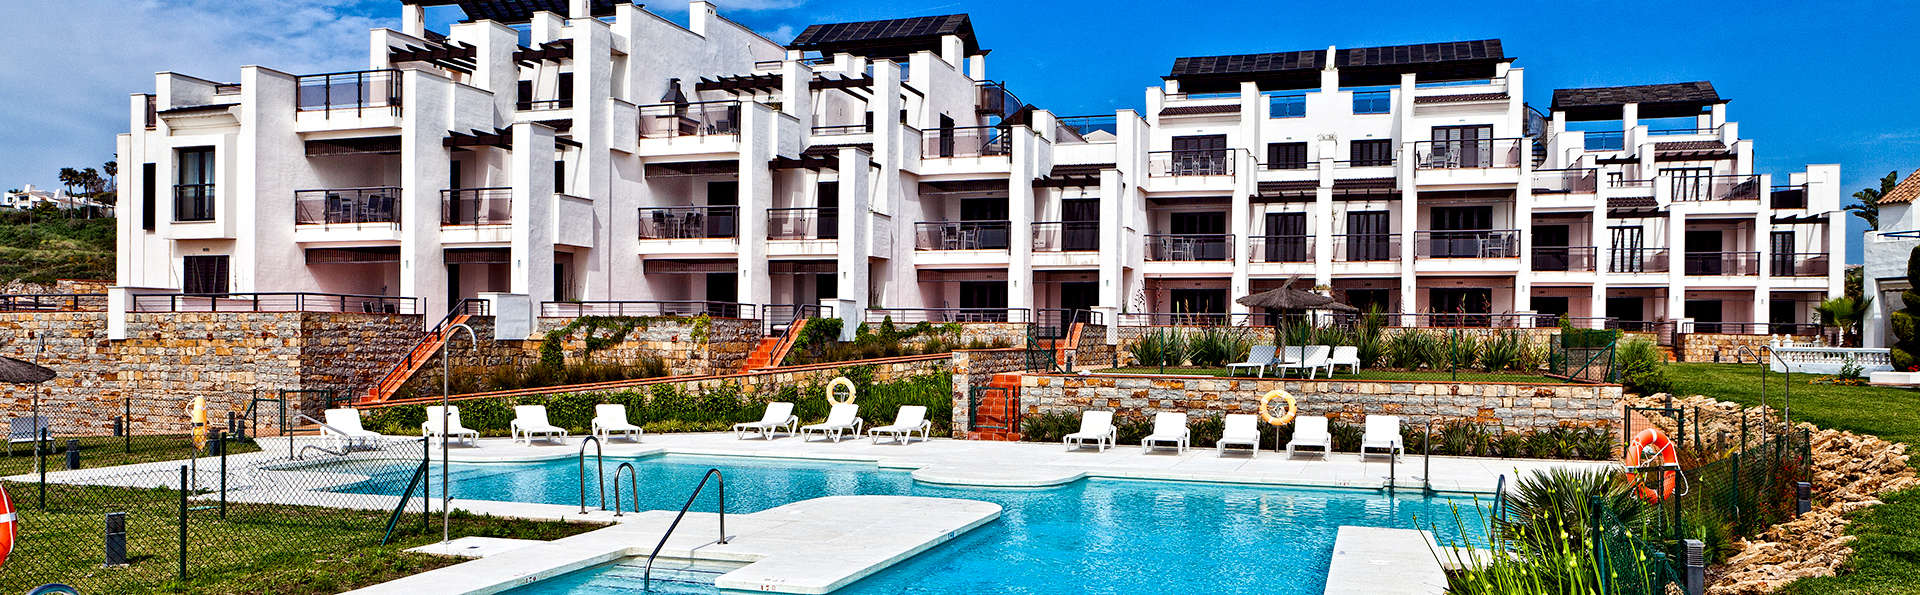 Casares del Mar Luxury Apartments - Edit_Front.jpg